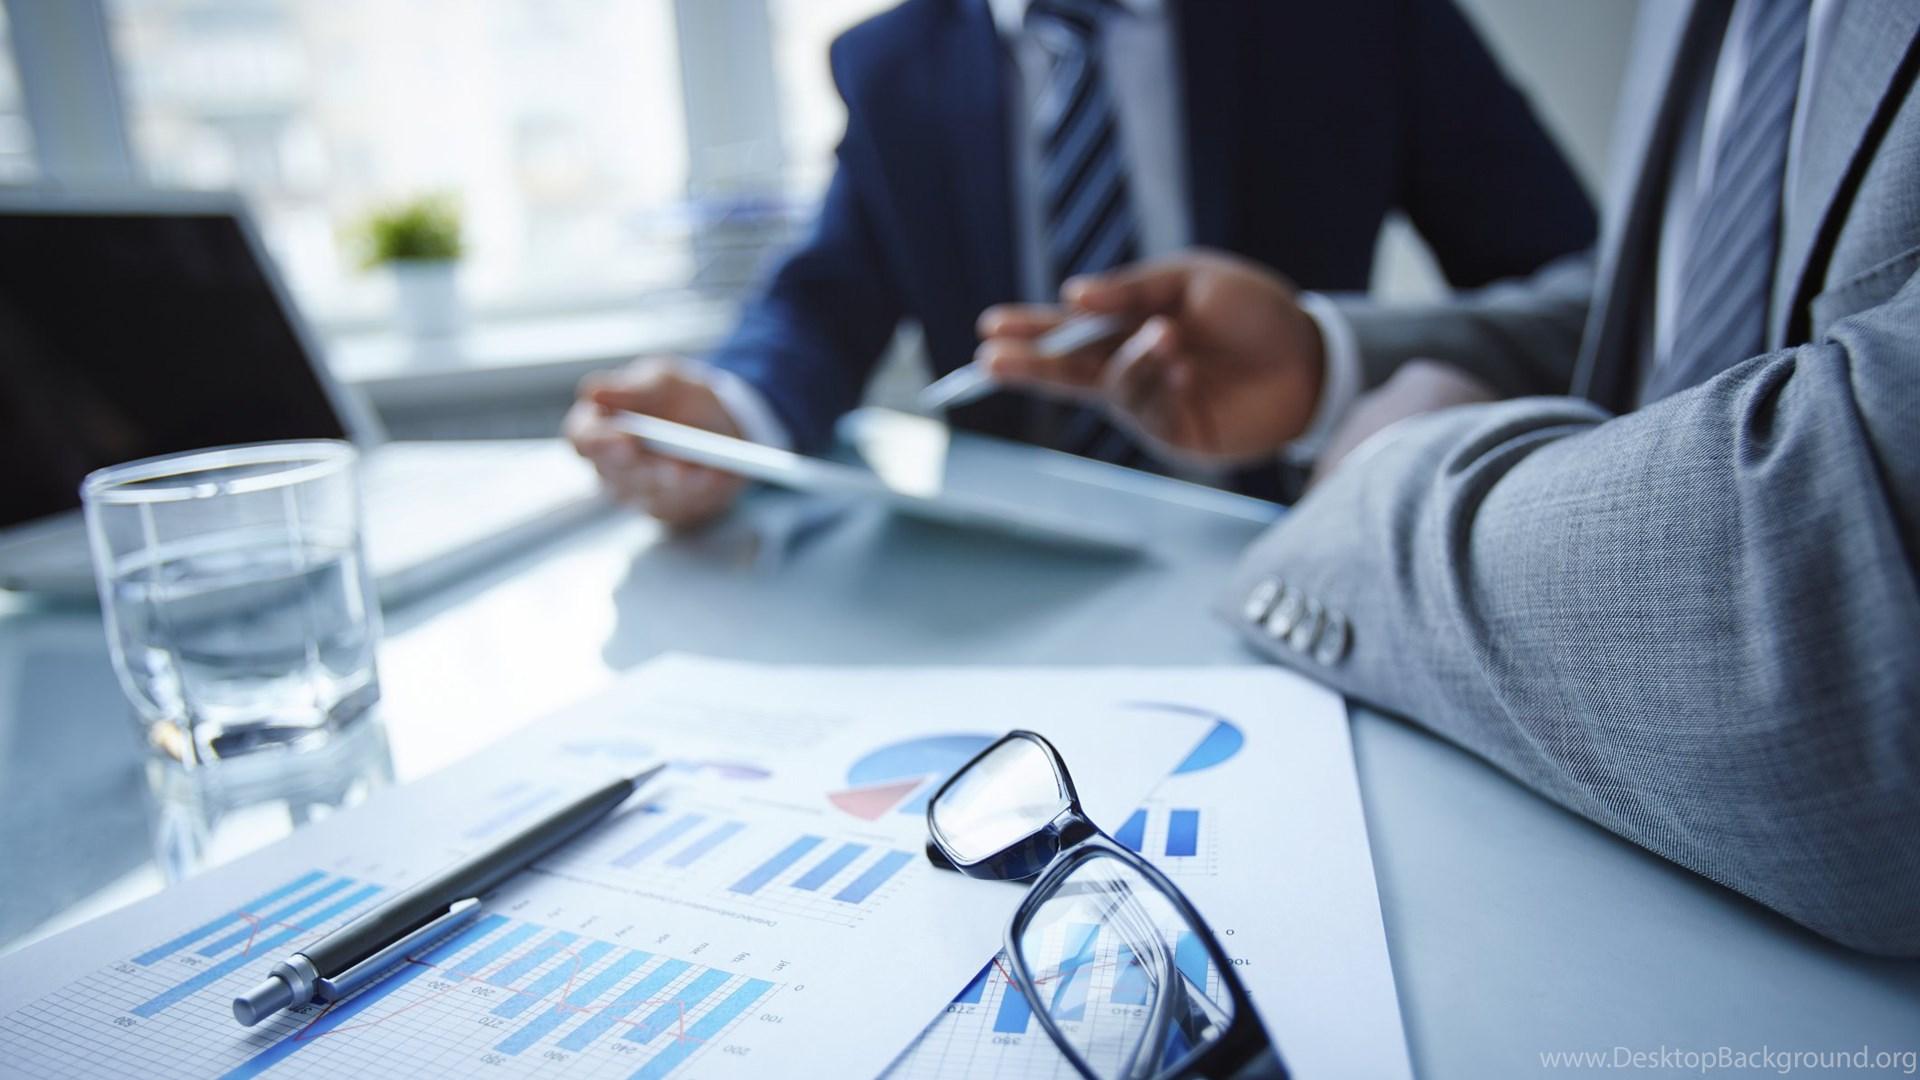 ✔ Peluang bisnis 2020, Bisnis Online Dropship Modal Kecil